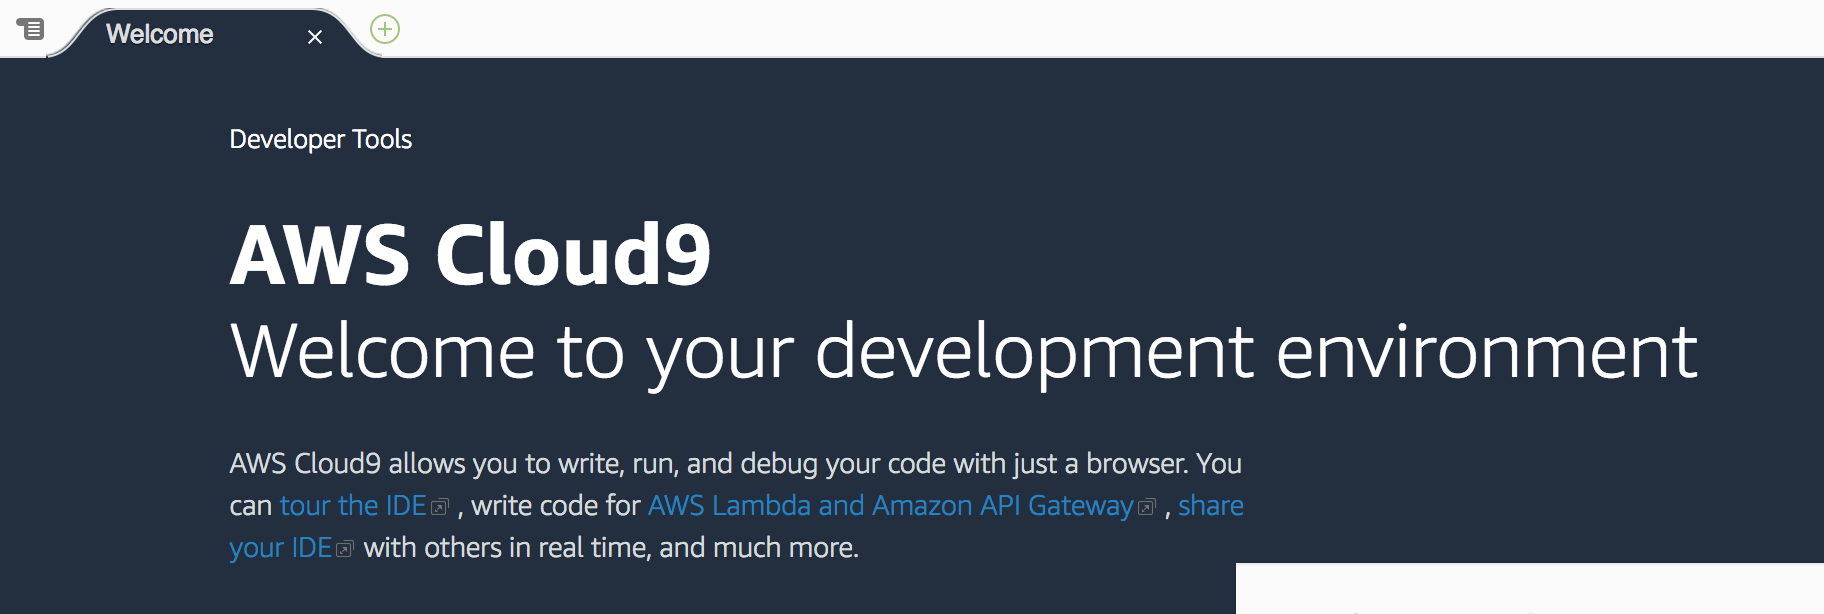 re:Invent 2018 Cloud9でAWS CLI v2 を動かそう